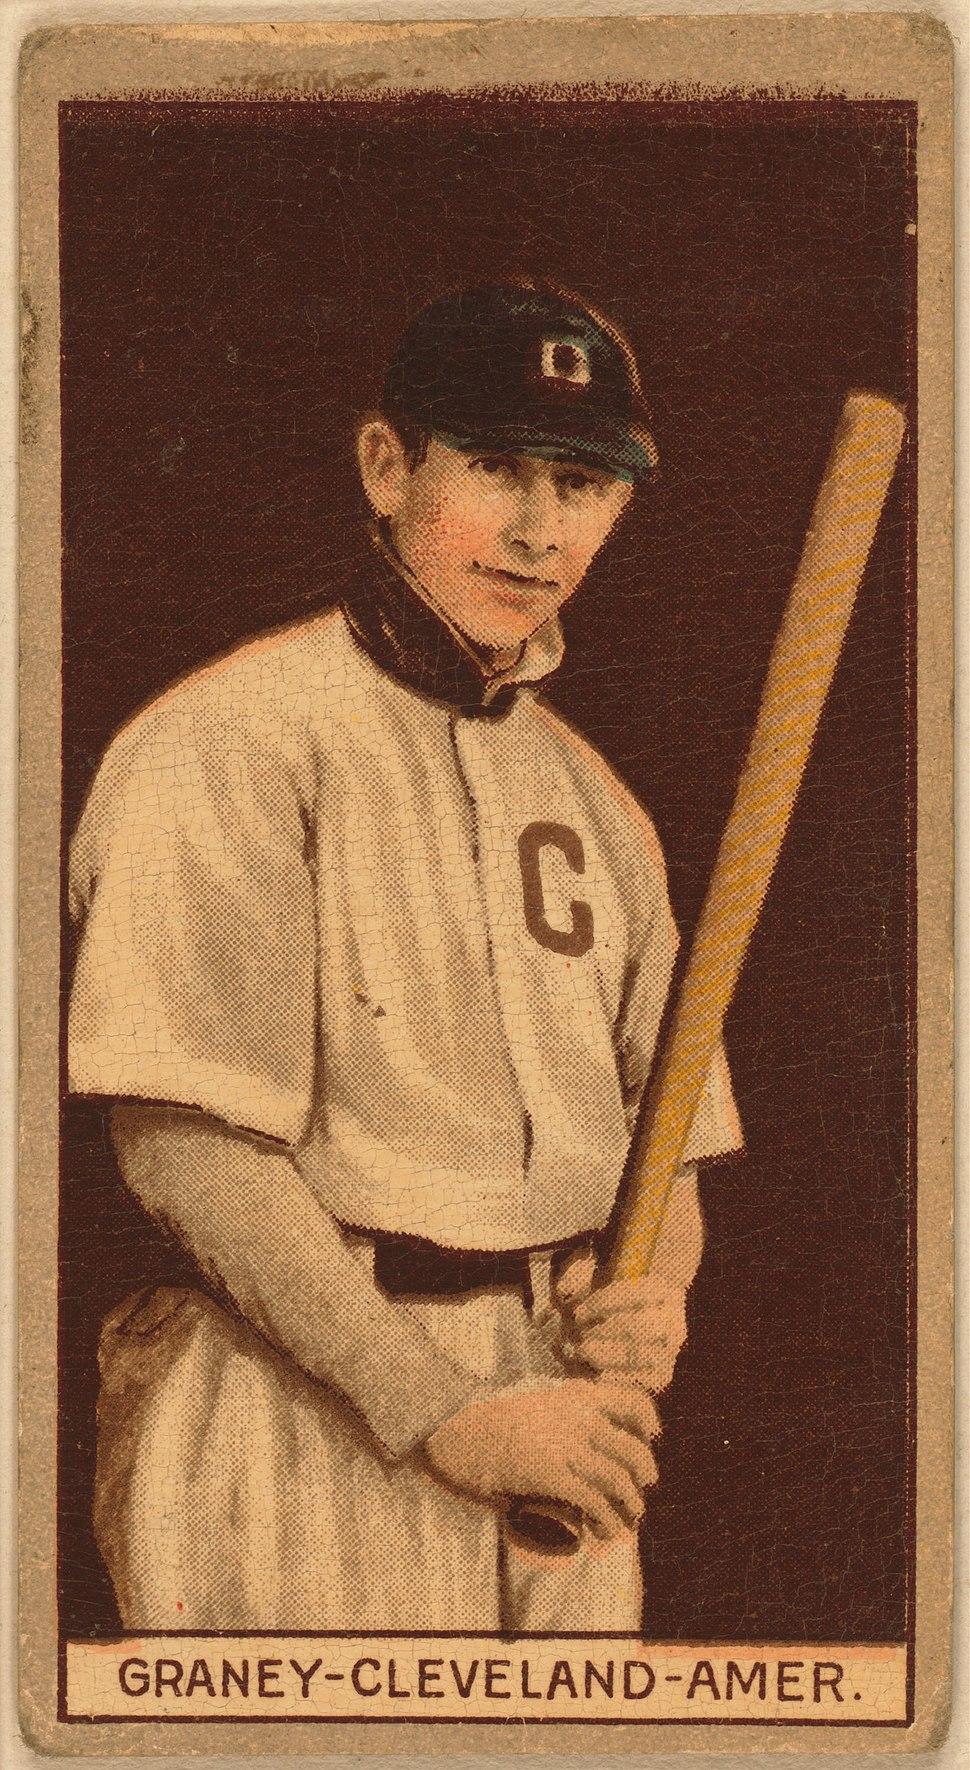 Jack Graney baseball card